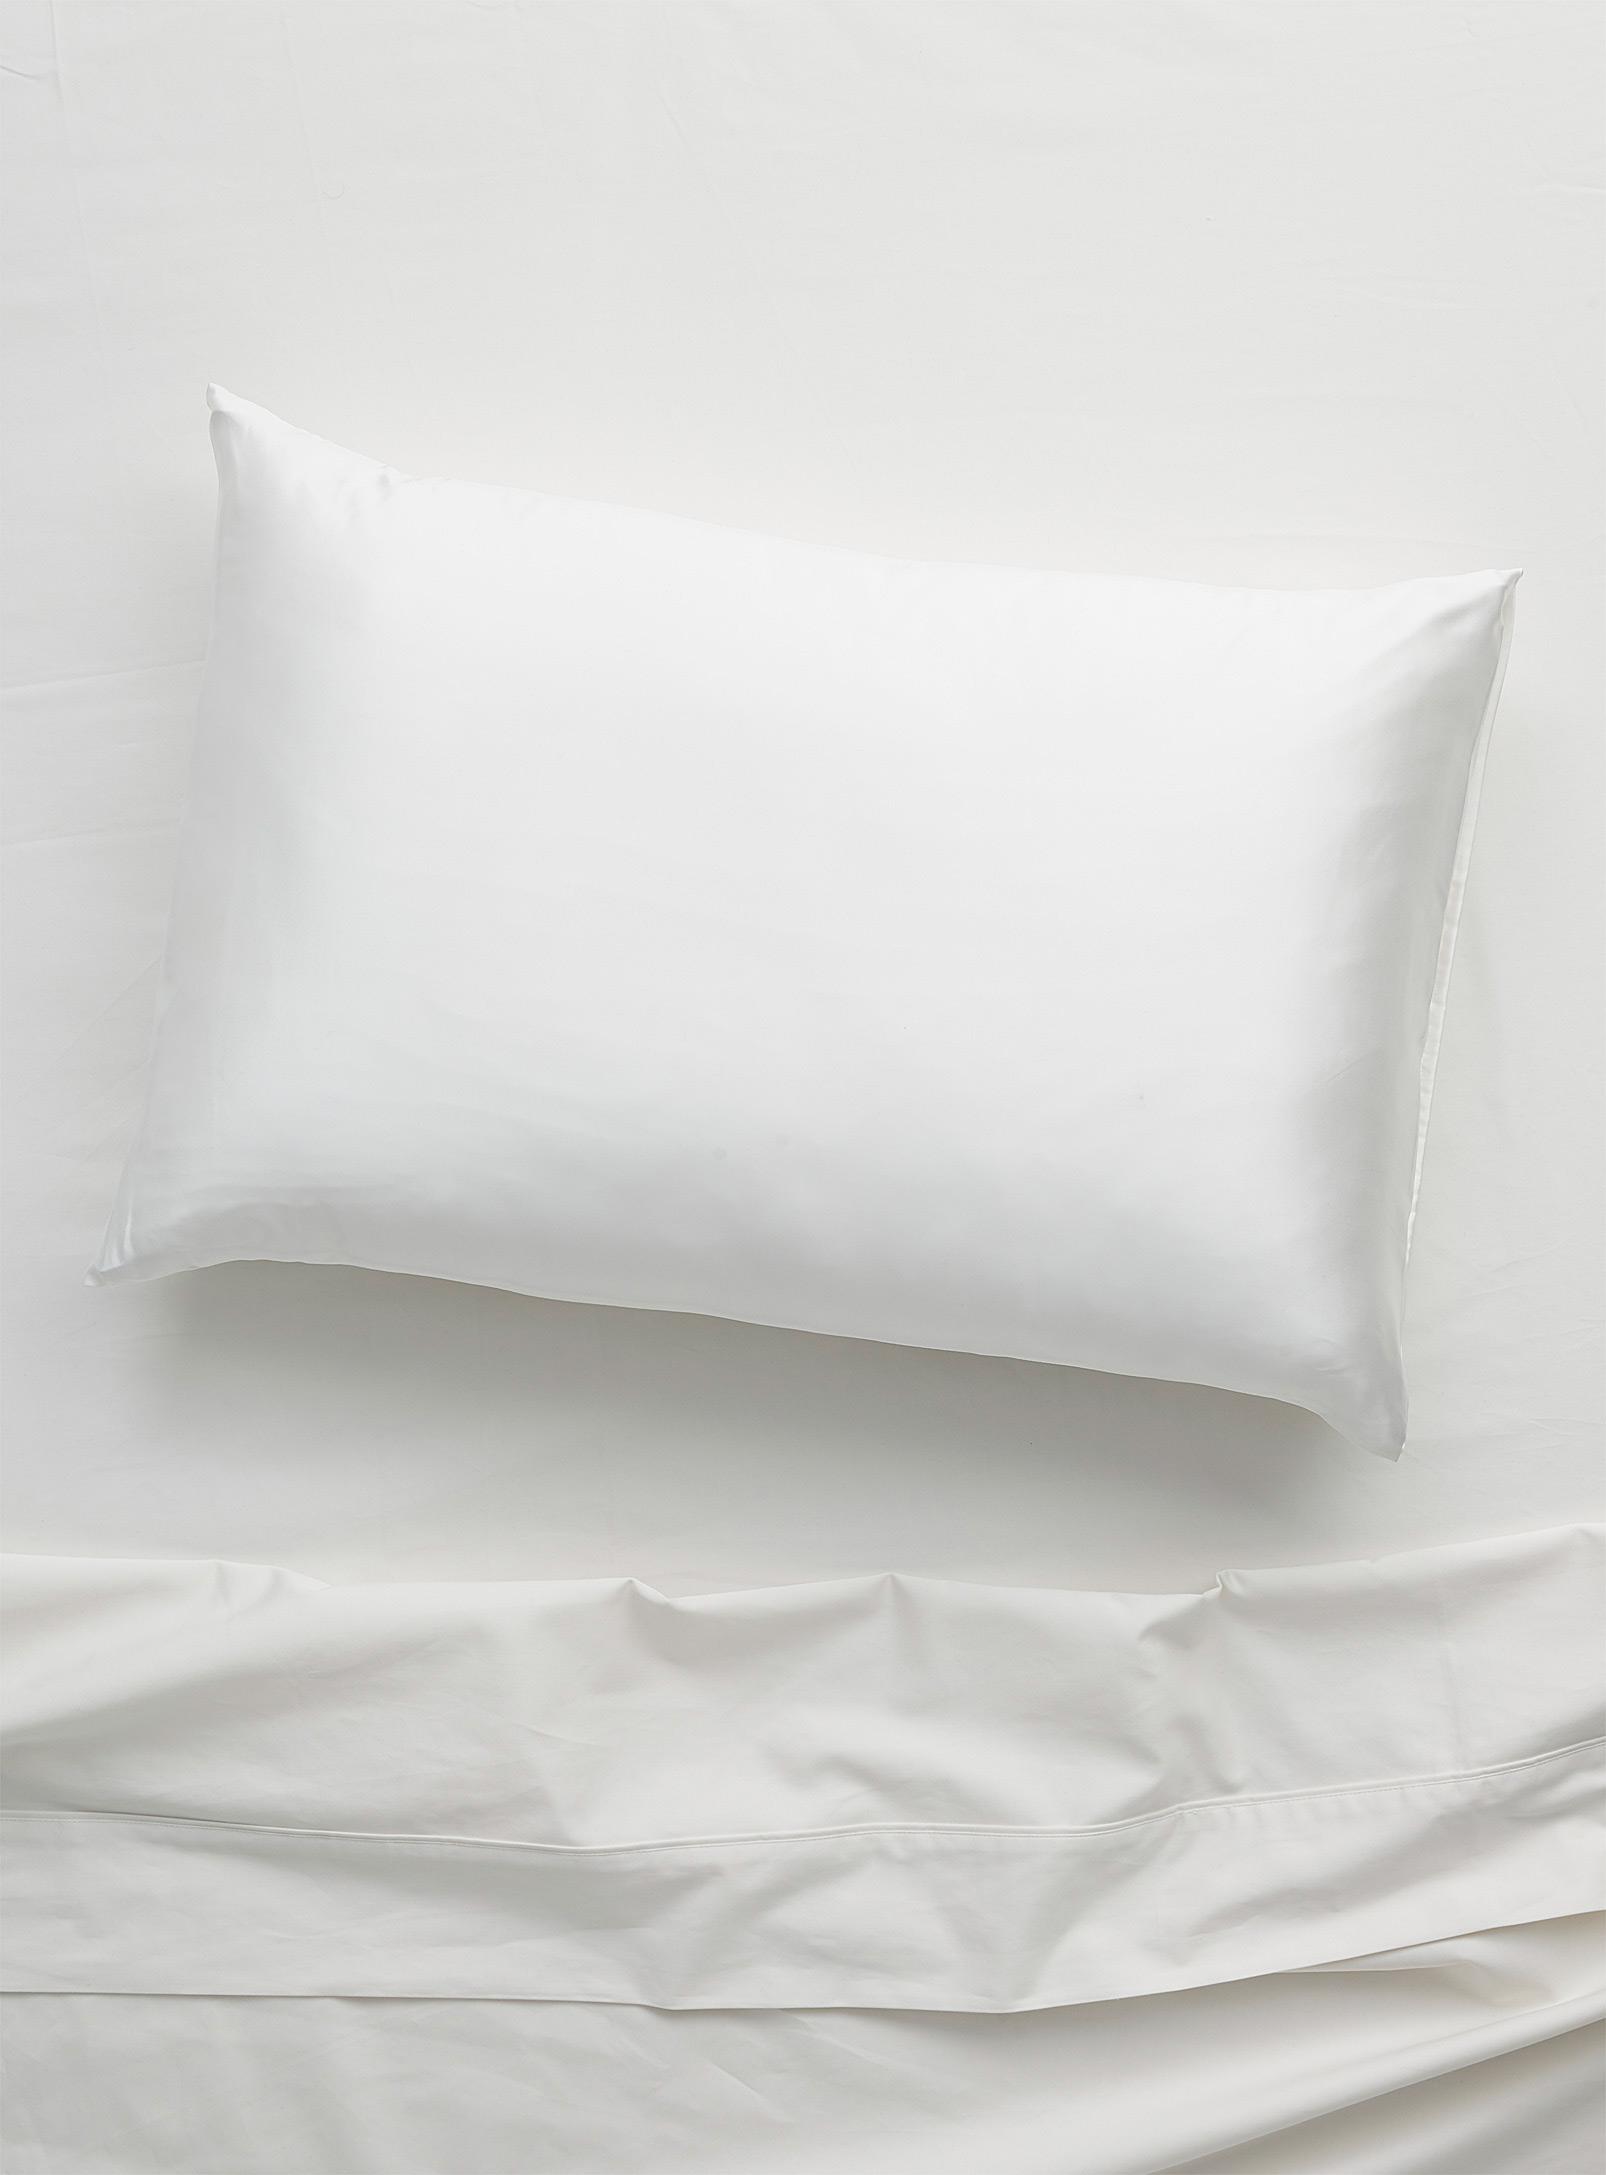 Simons - La Maison Simons Deluxe Silky Pillowcase